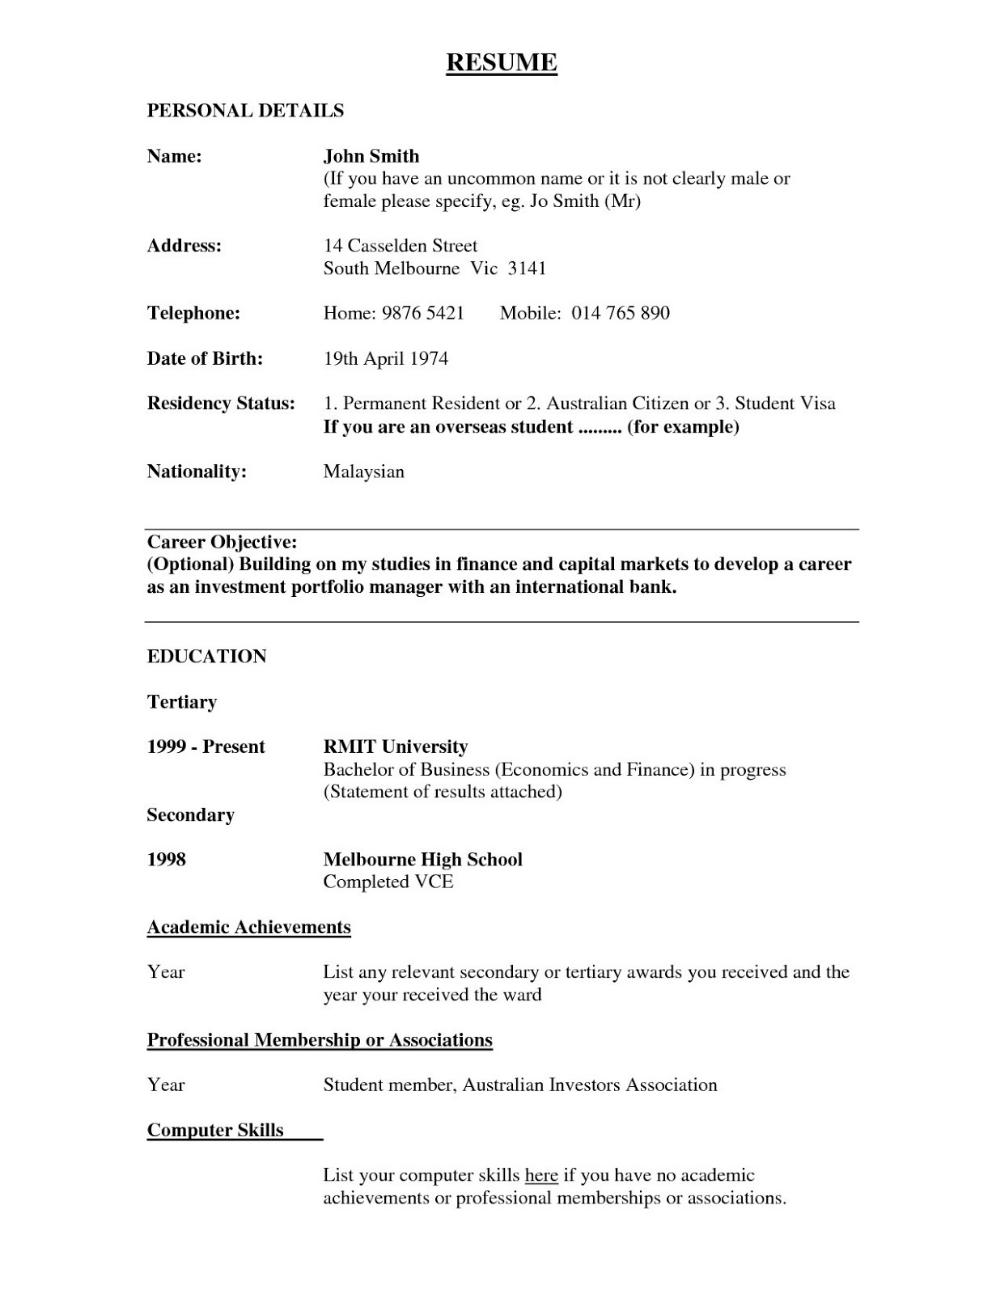 Academic resume examples academic resume examples college